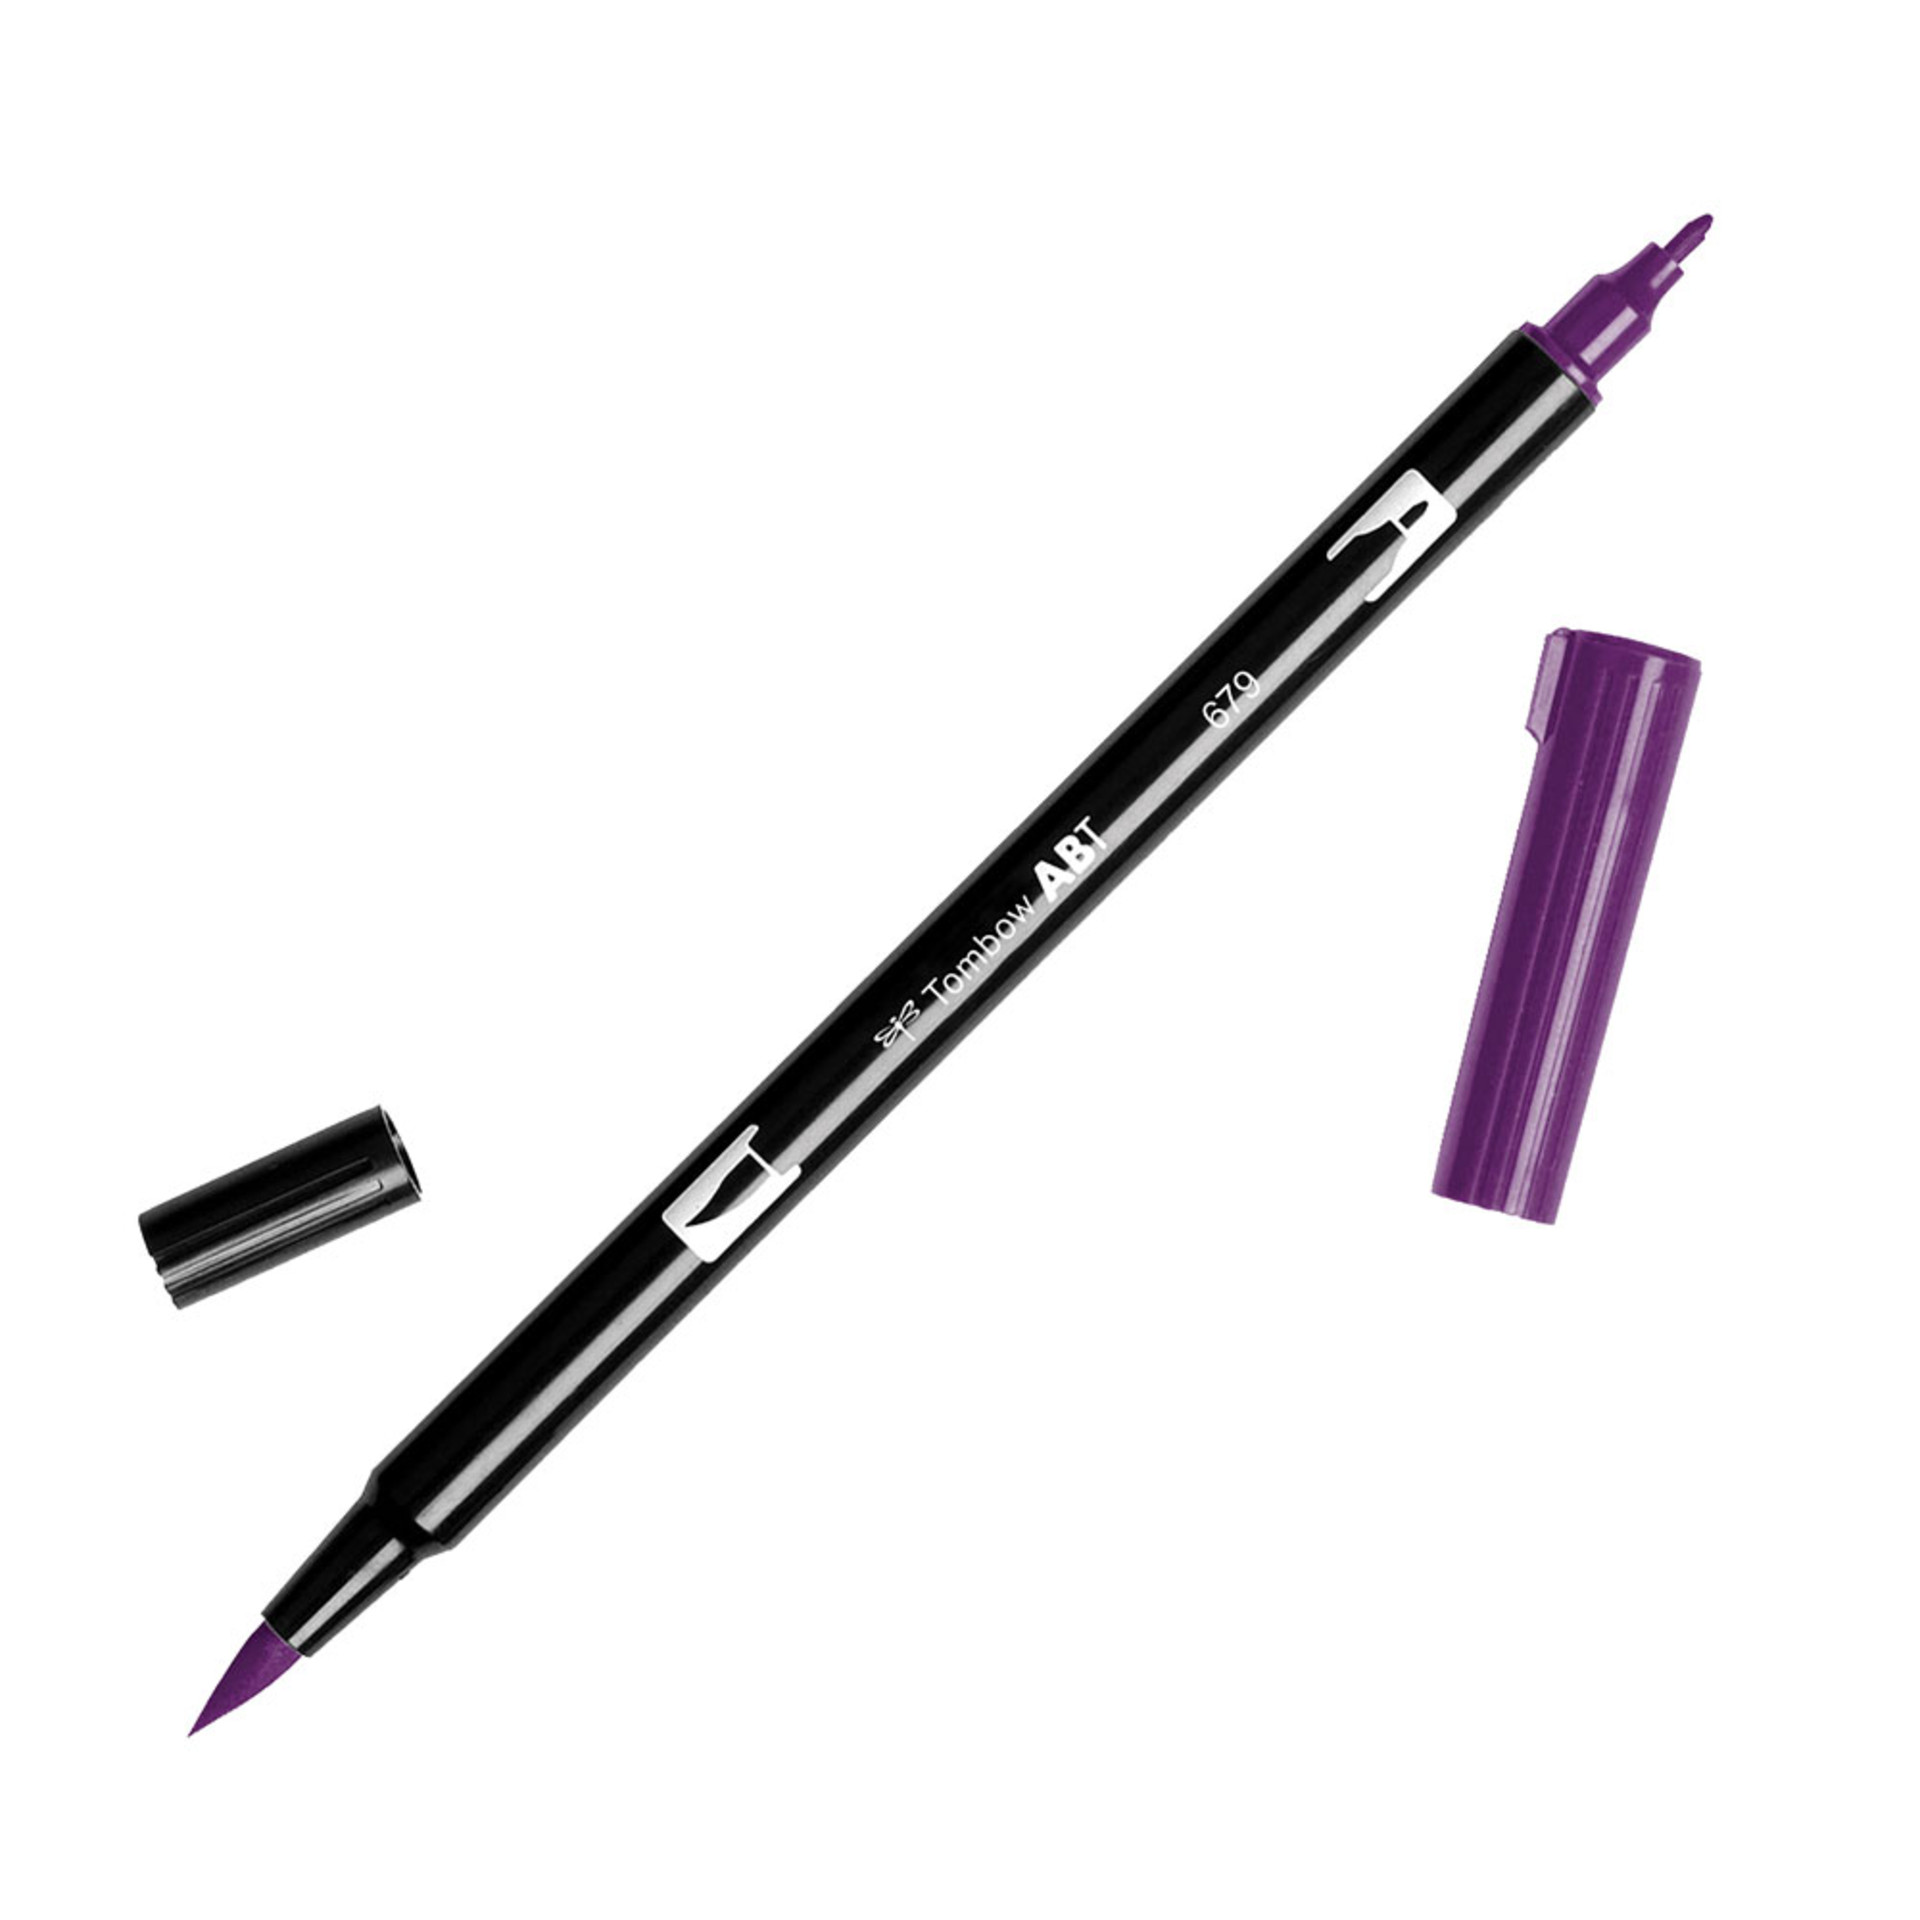 Tombow Dual-Tip Brush Marker Pen – Plum